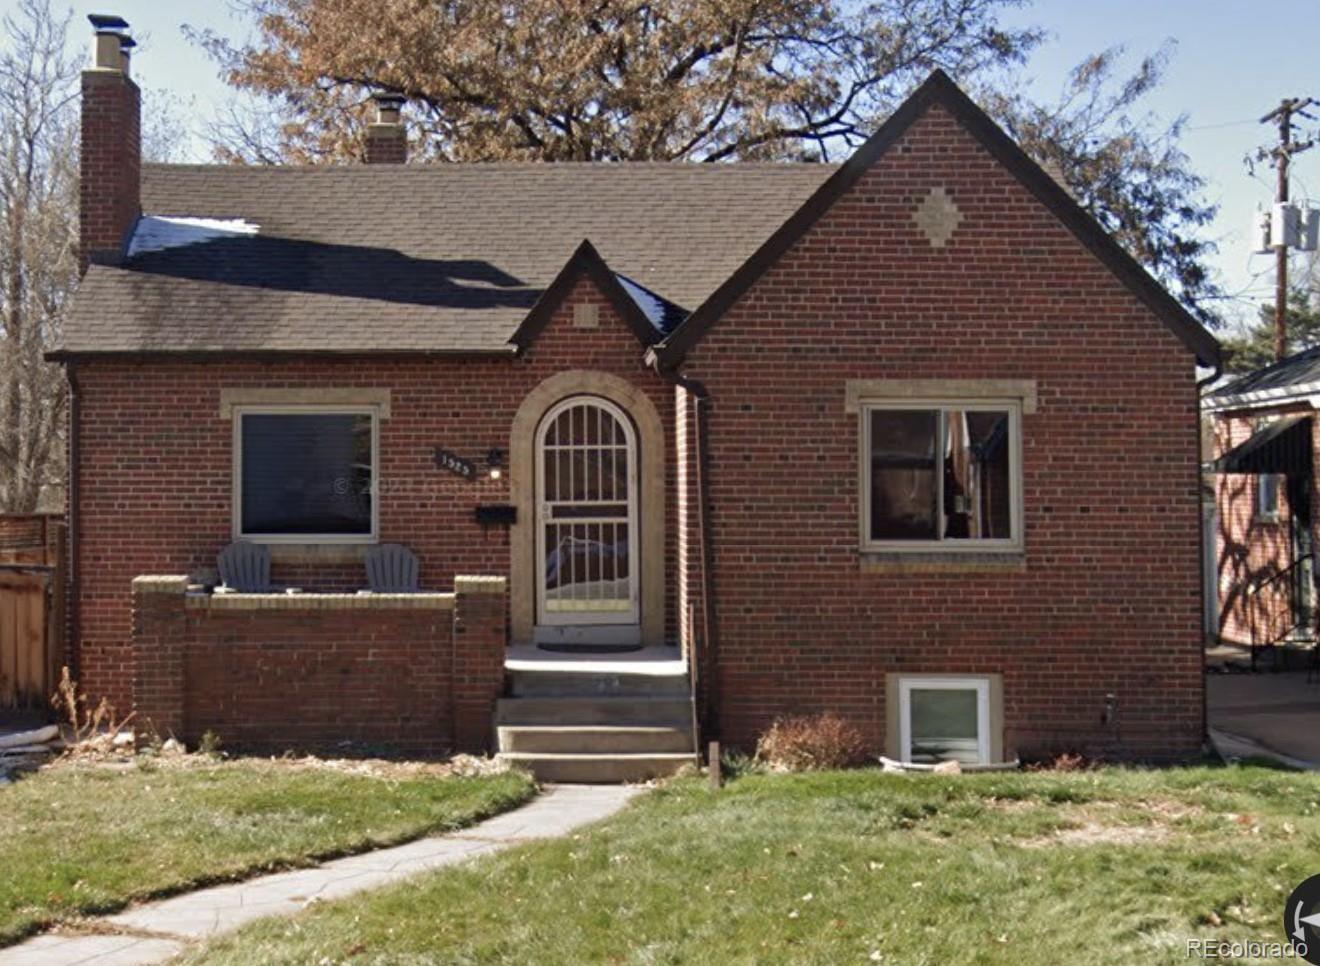 Photo of 1525 Holly Street, Denver, CO 80220 (MLS # 3416733)